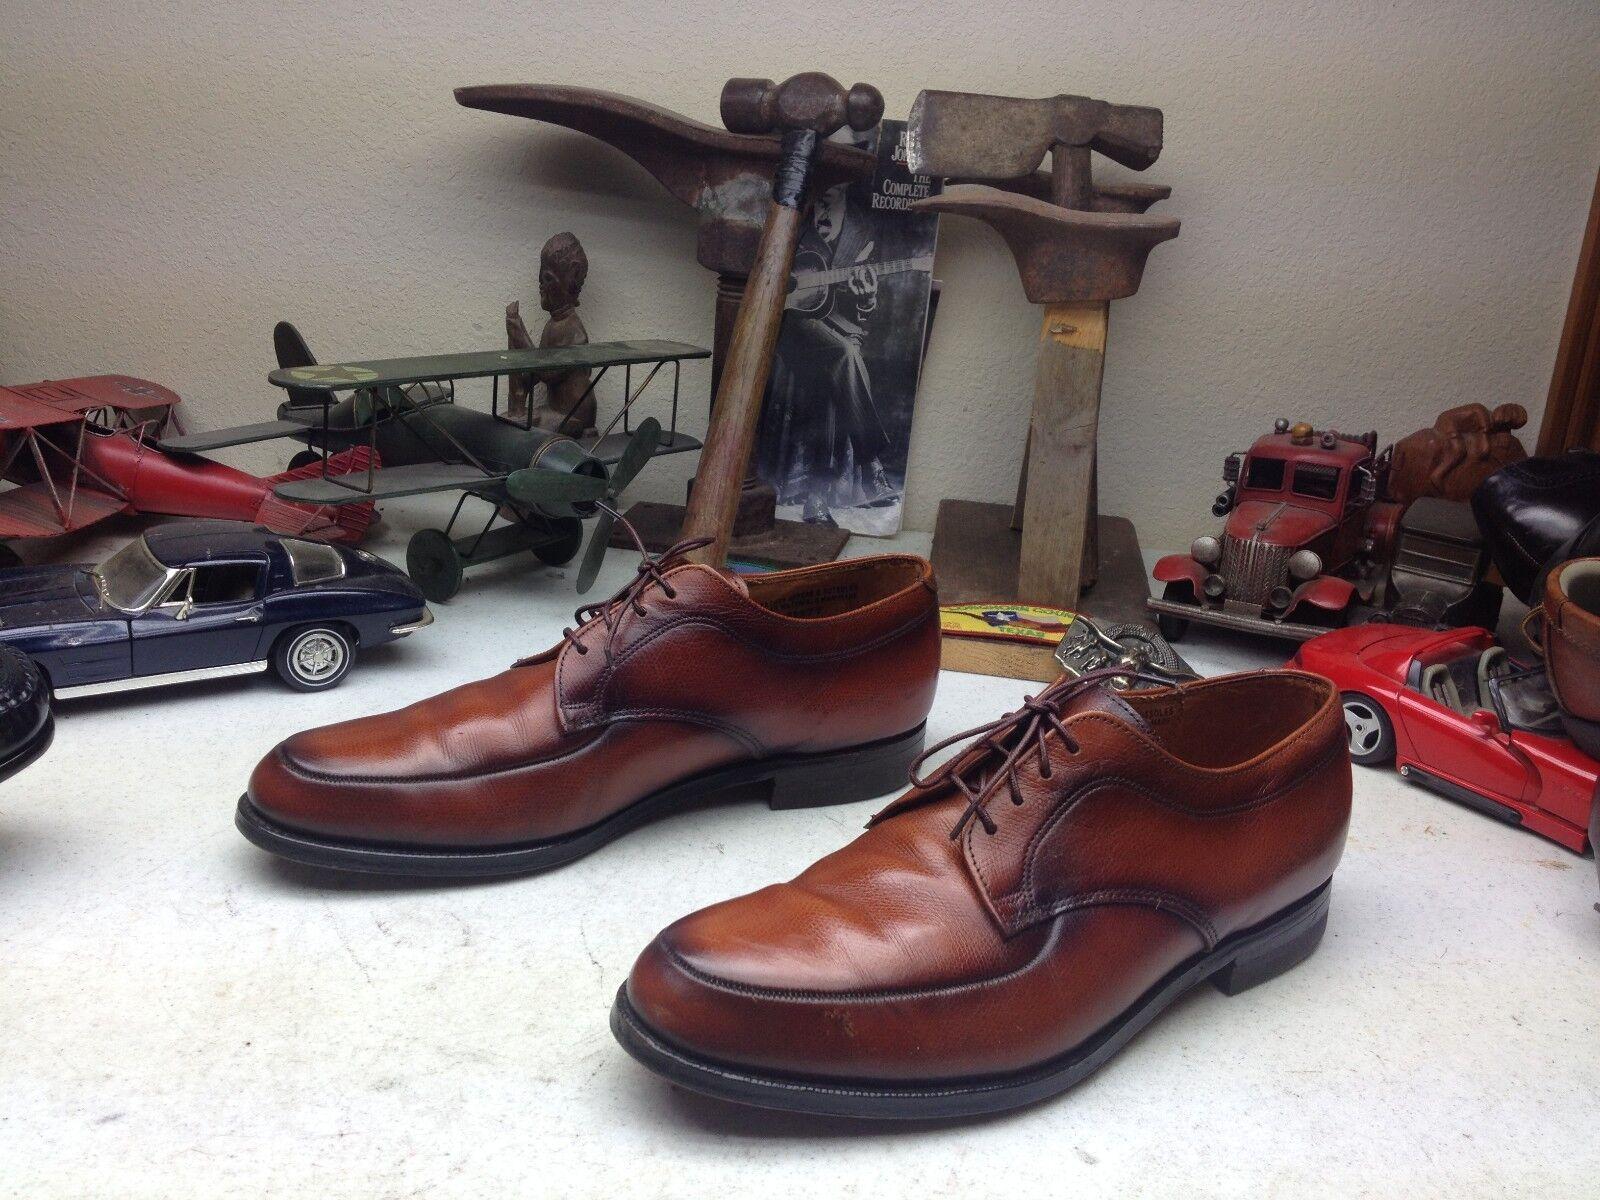 risparmia il 50% -75% di sconto VINTAGE VINTAGE VINTAGE USA JARMAN RUSTIC Marrone LEATHER POWER OXFORD BUSINESS scarpe 11 D  più economico